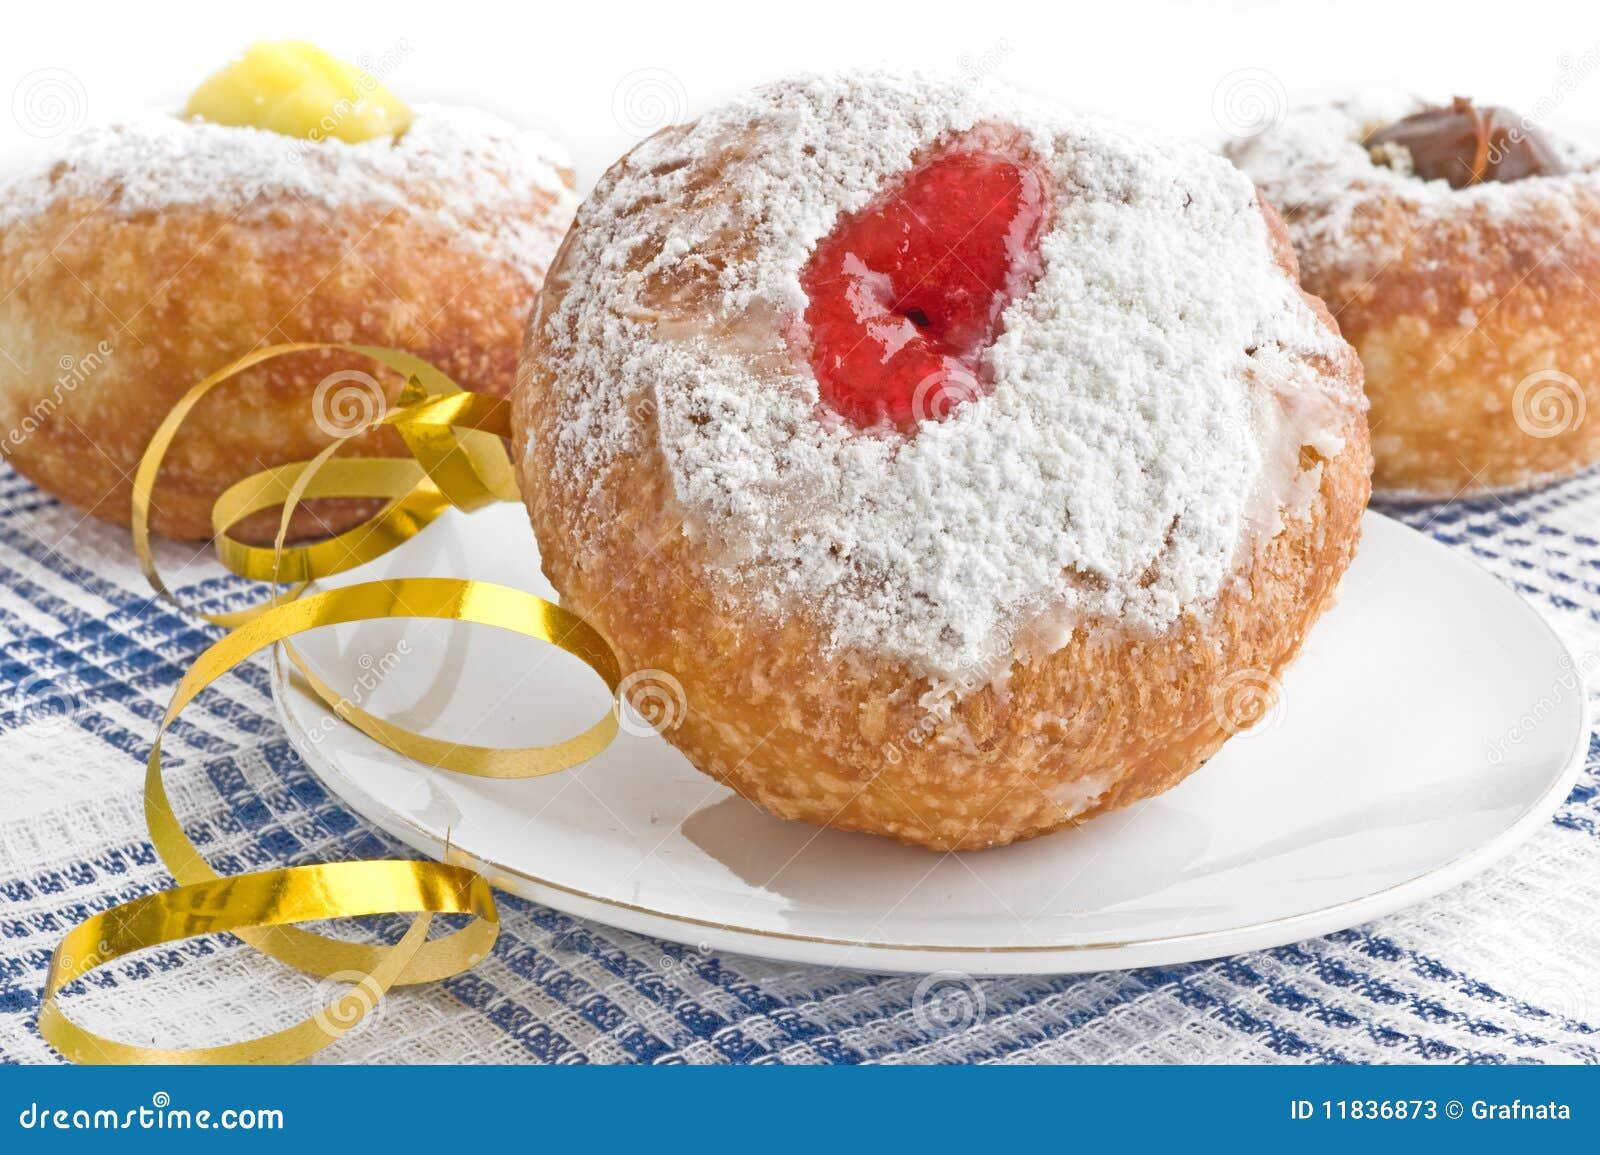 Celebrate Donut For Hanukkah Stock Photos - Image: 11836873